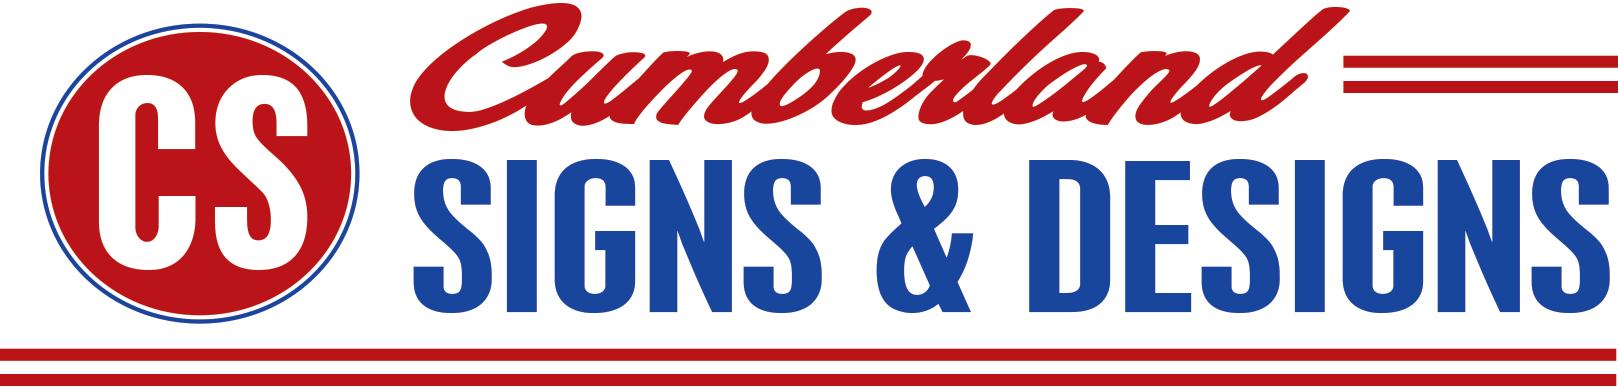 Cumberland Signs & Designs